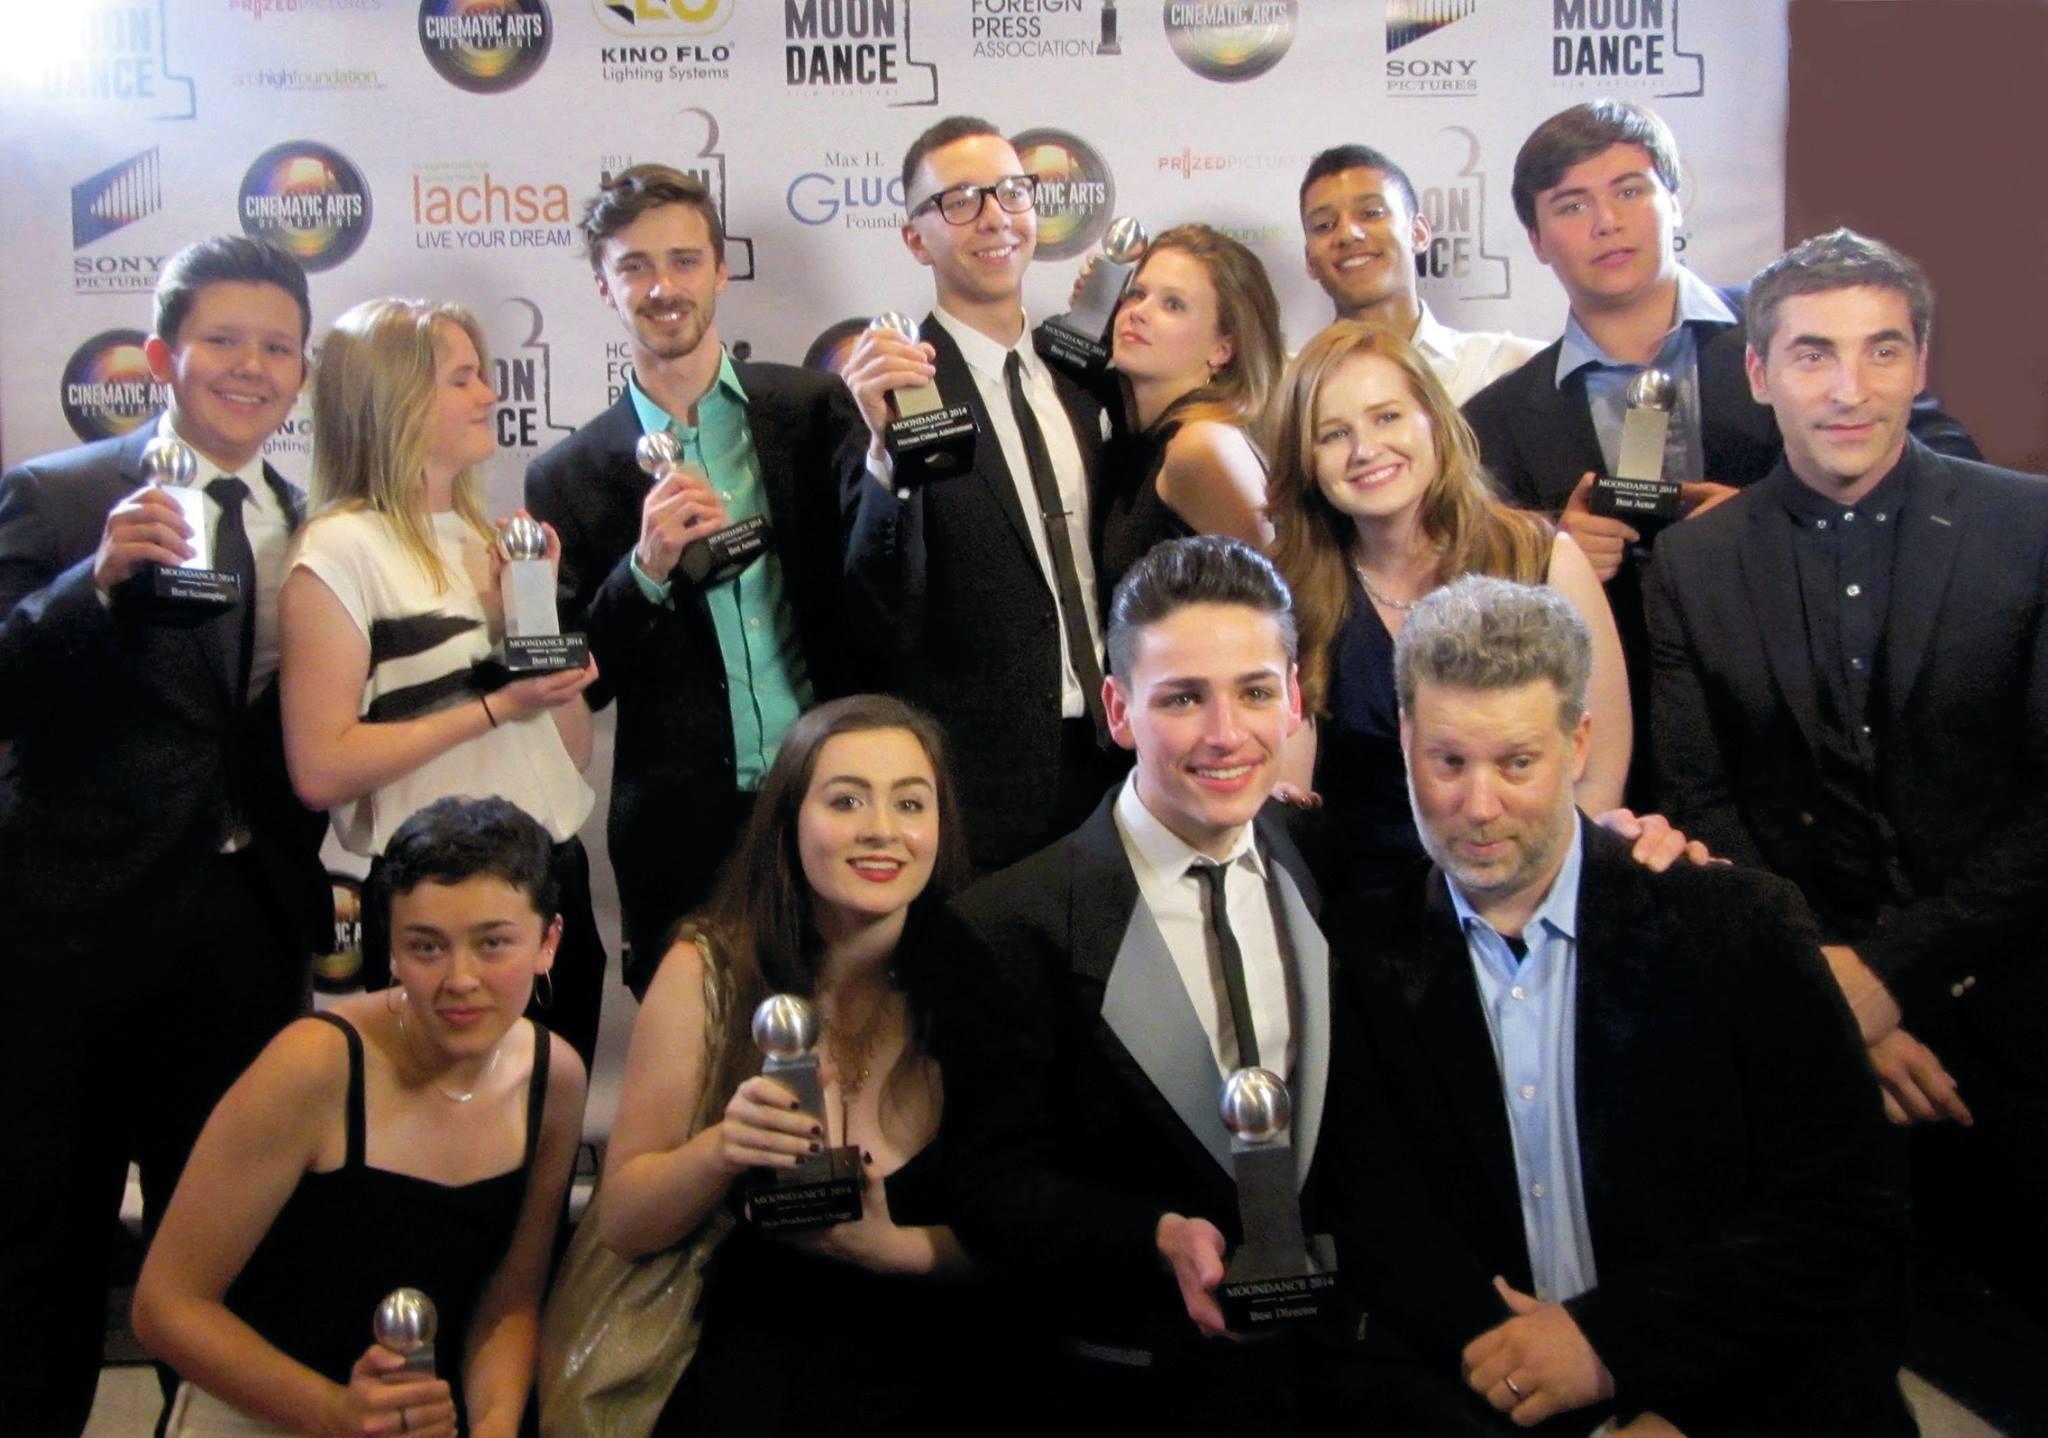 2014 MoonDance Winners